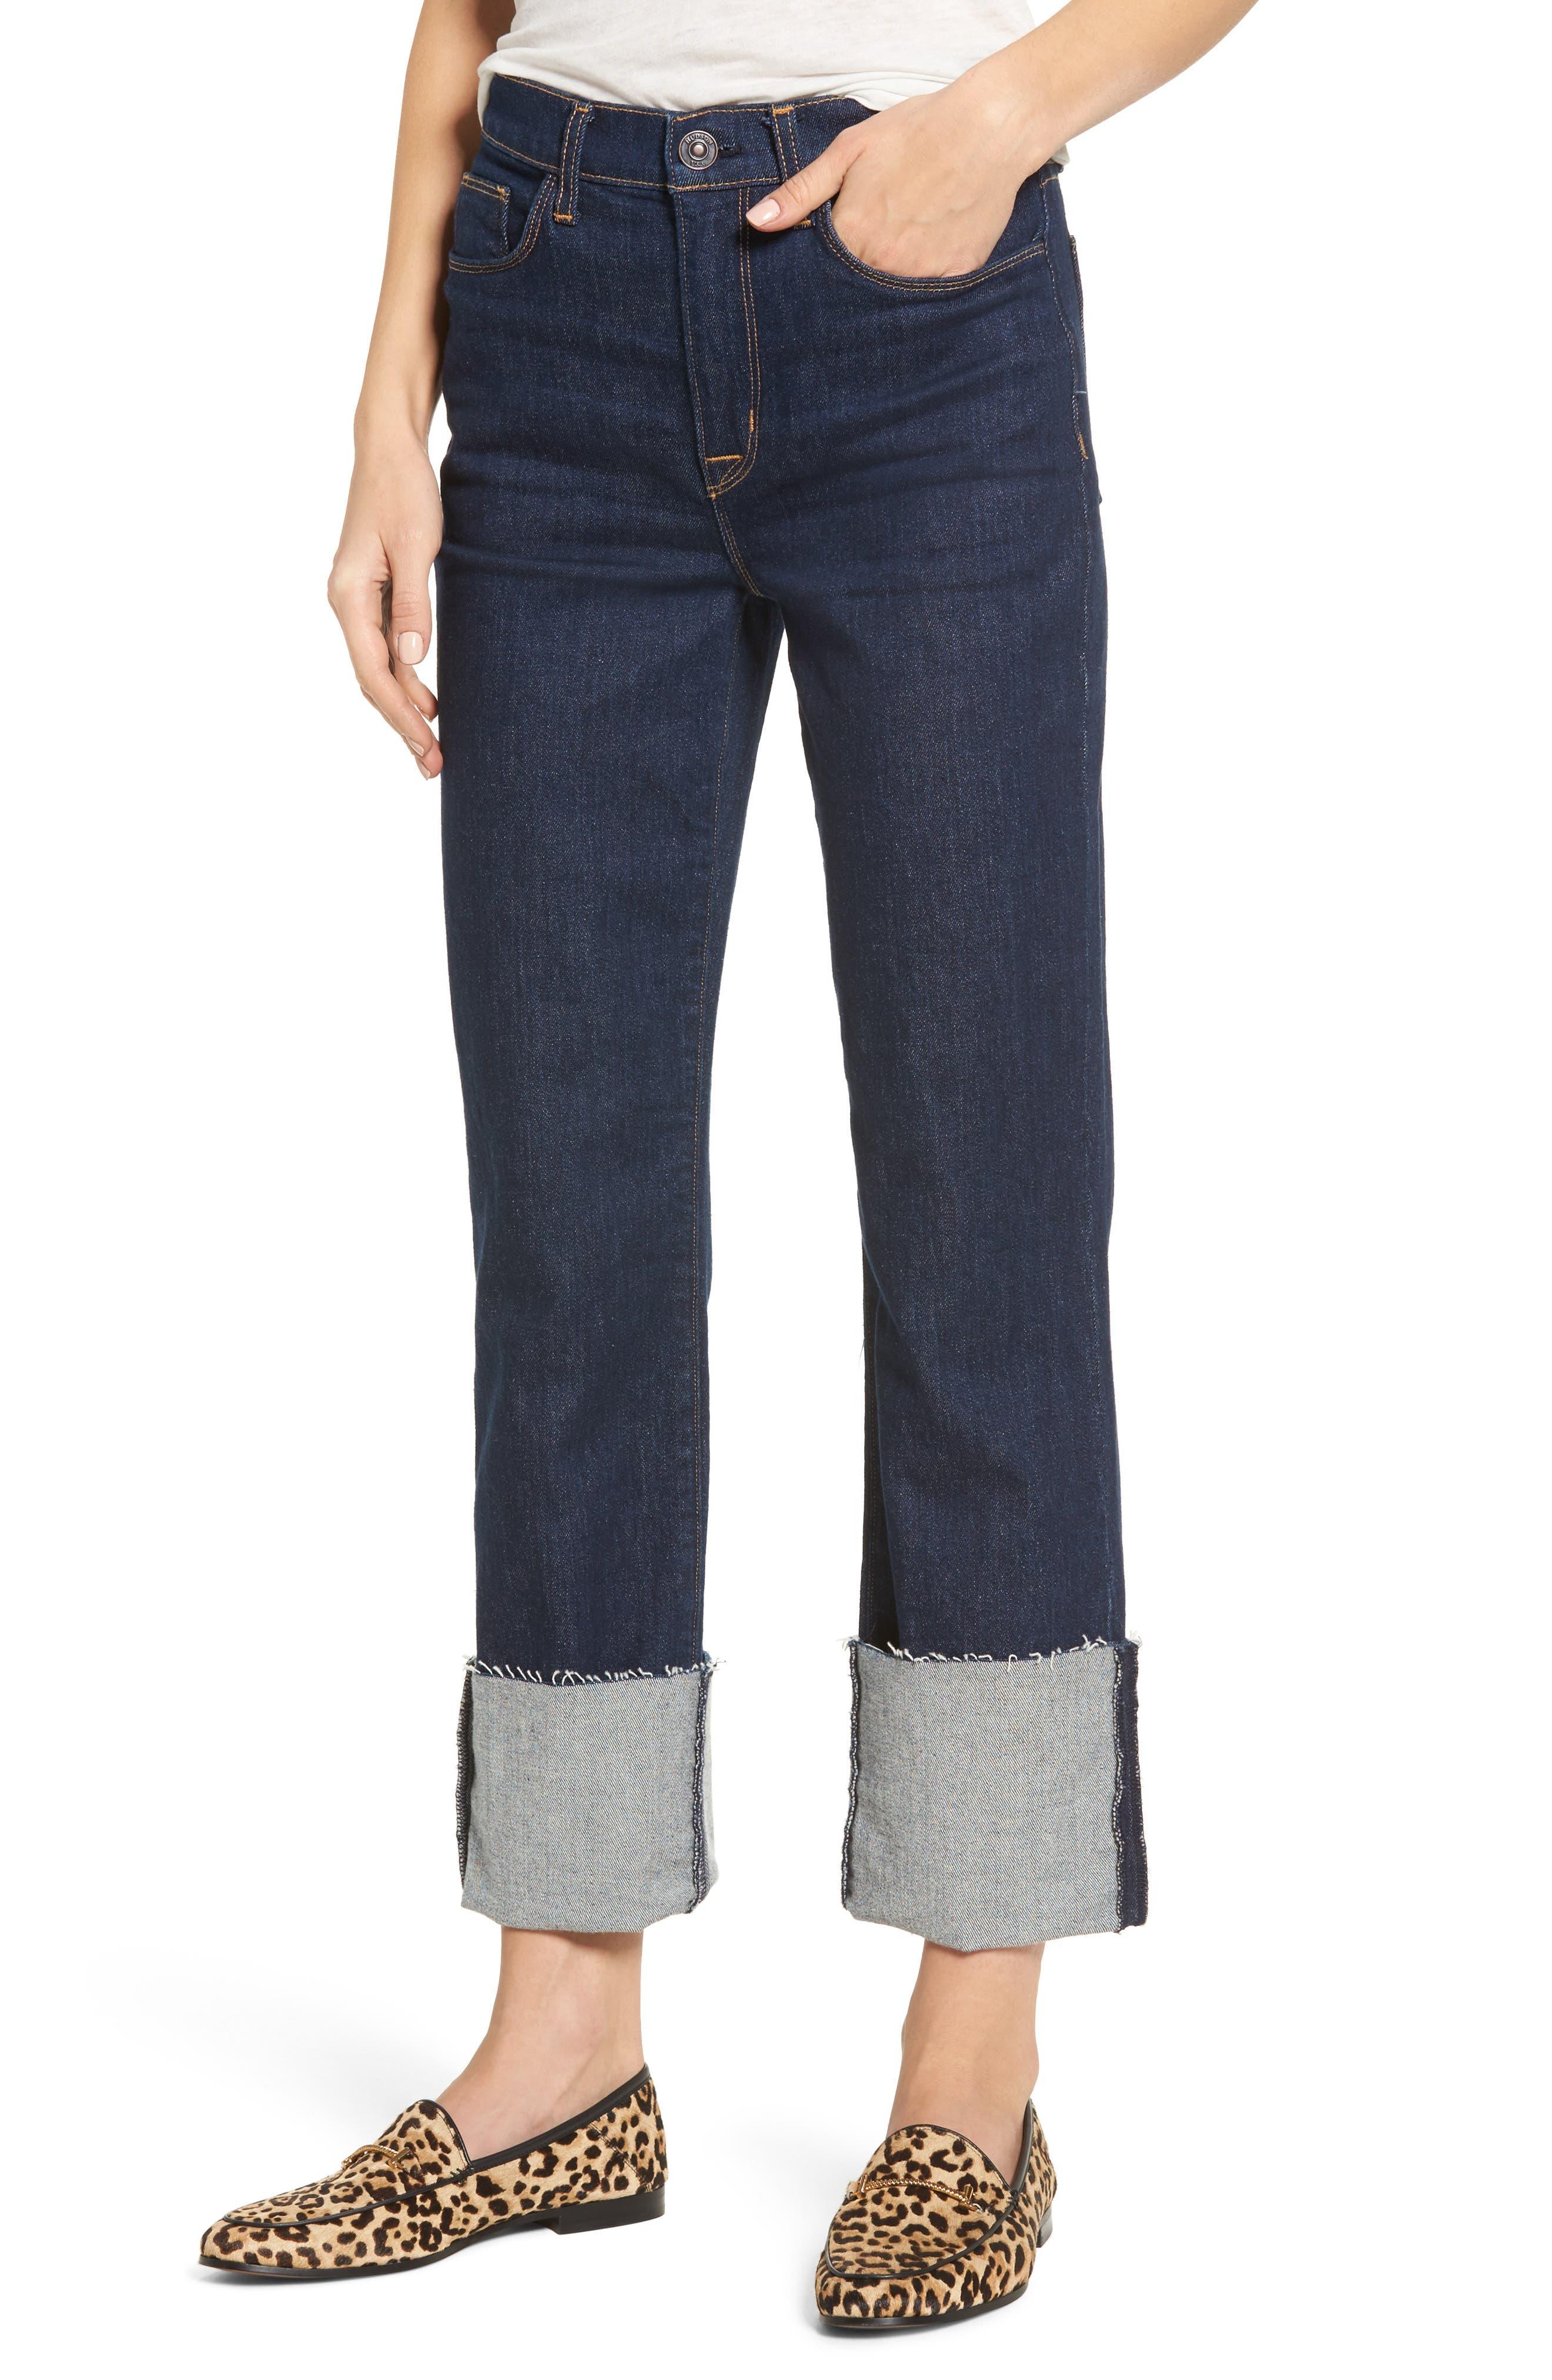 Zoeey High Waist Crop Straight Leg Jeans,                             Main thumbnail 1, color,